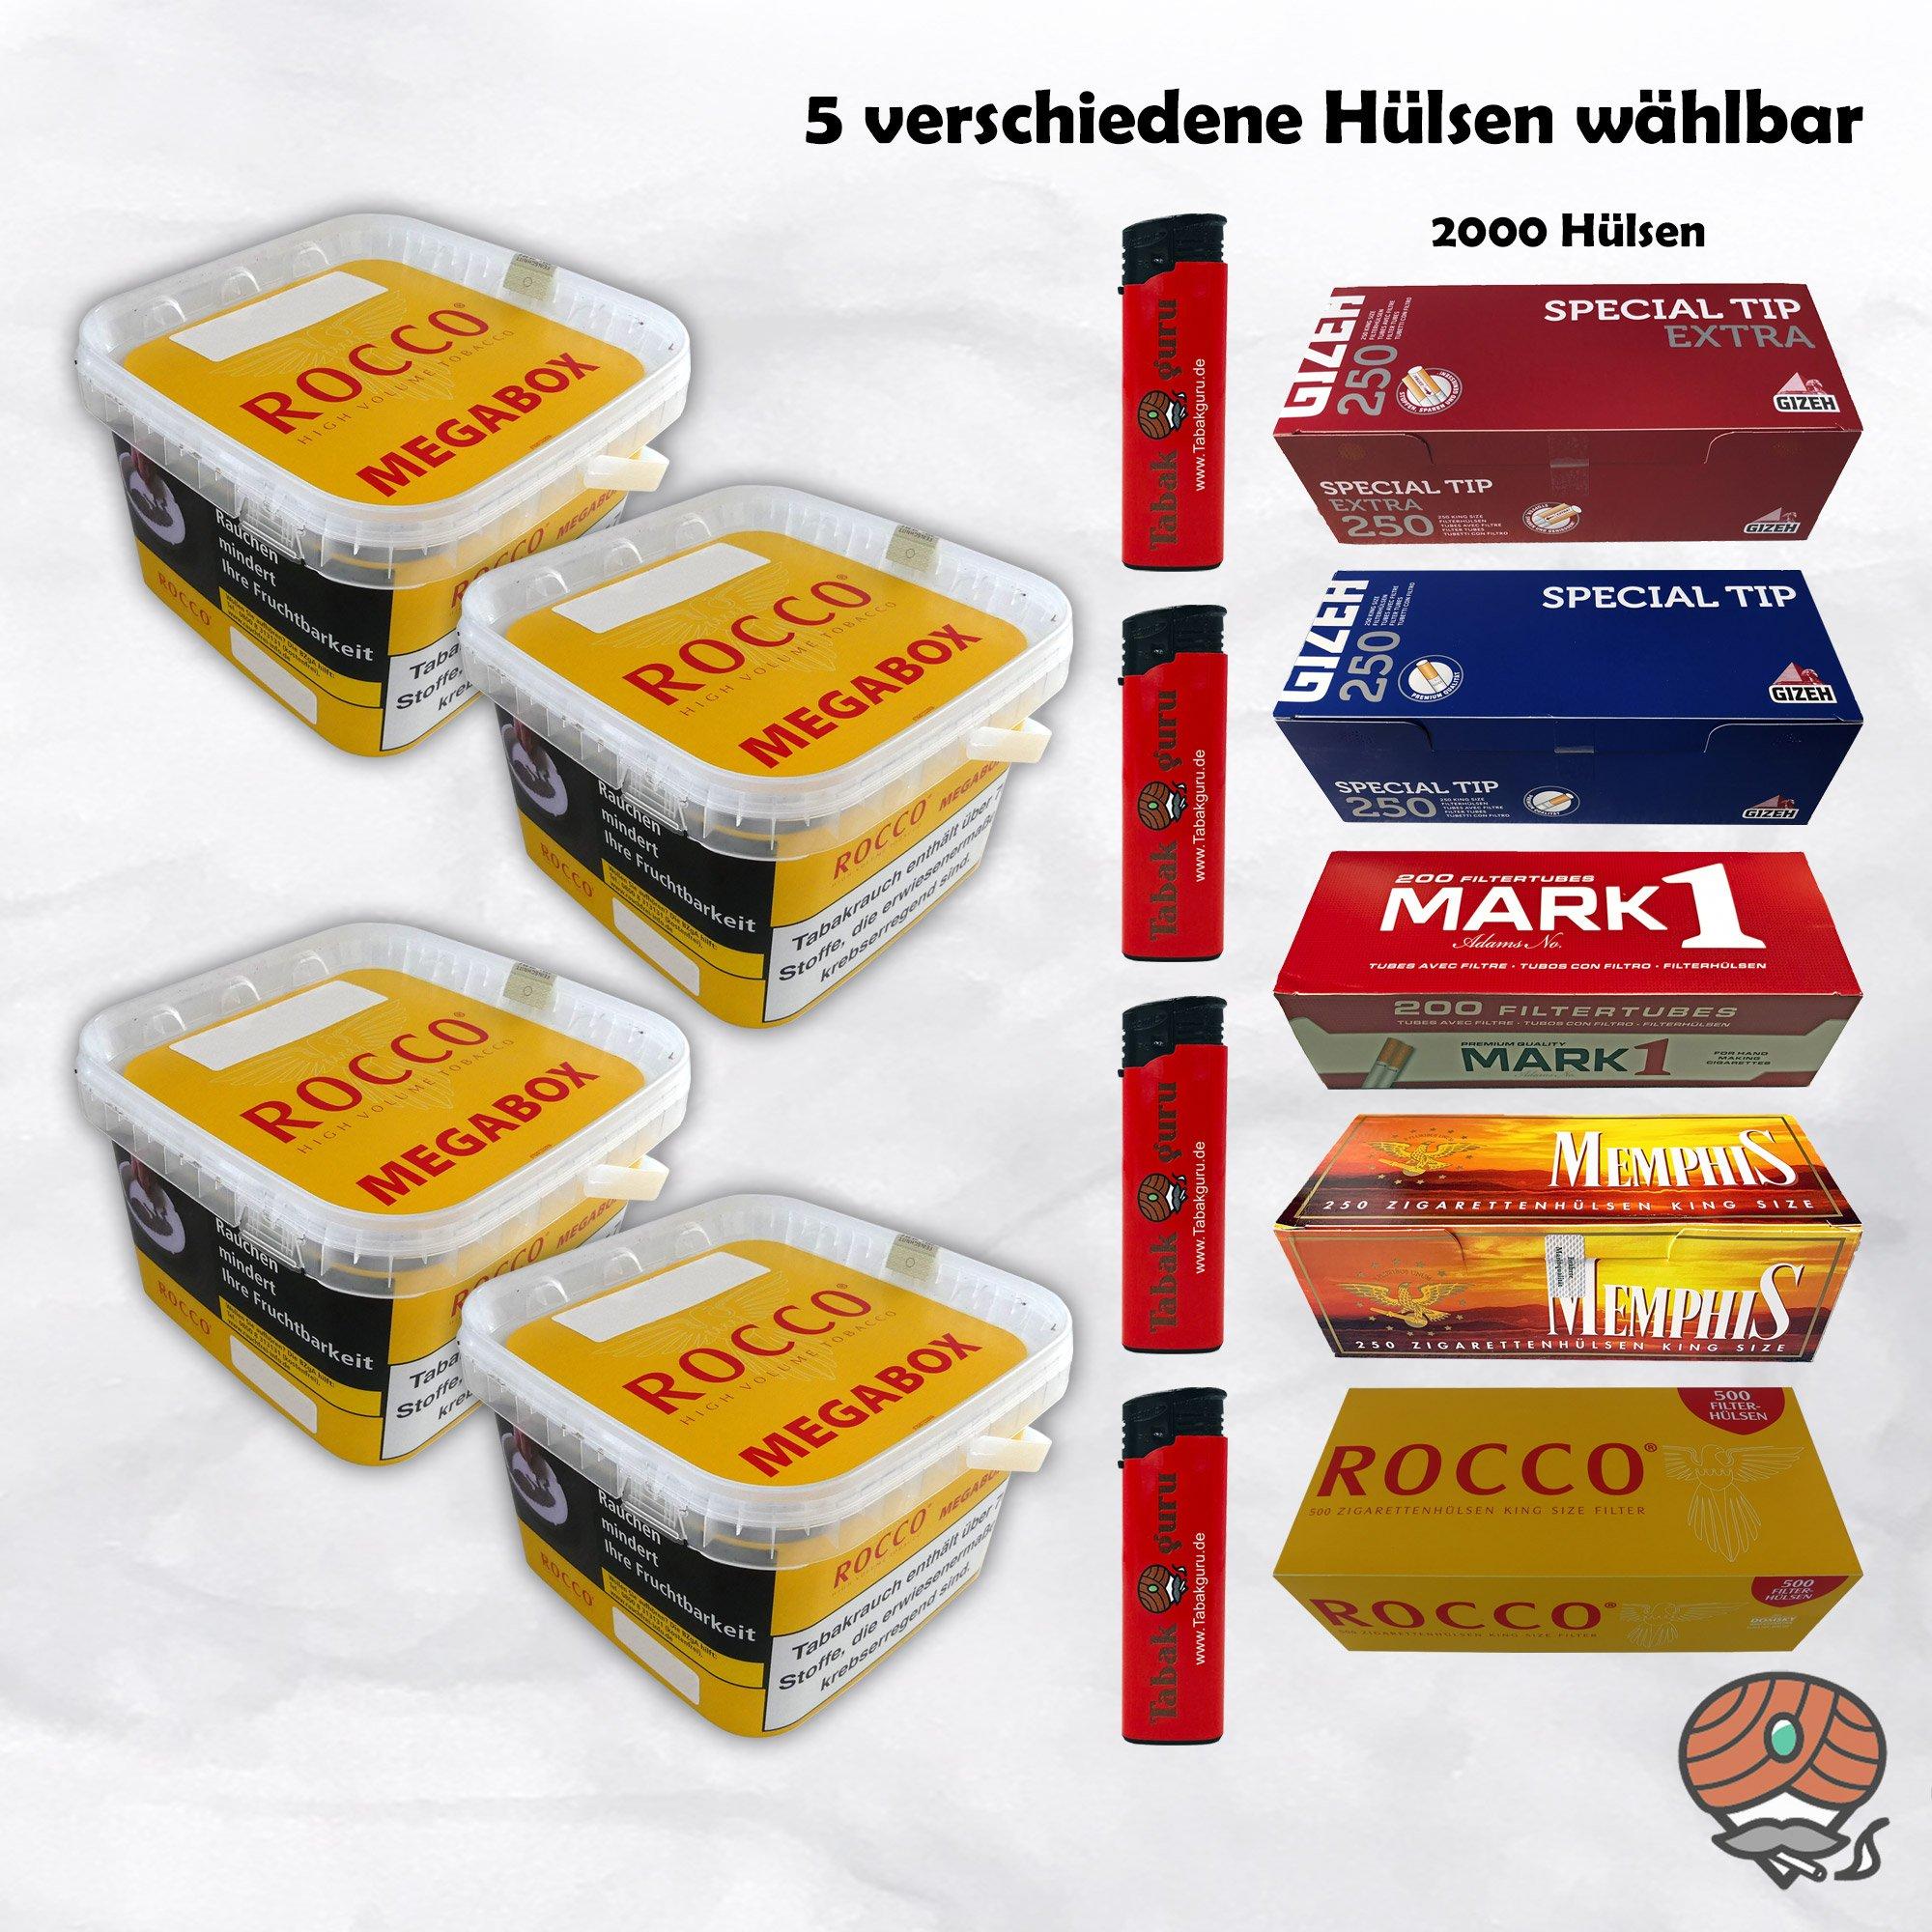 4 x ROCCO Volumentabak Gelb Megabox 210 g + 2.000 Hülsen wählbar - Angebot ohne Hülsen